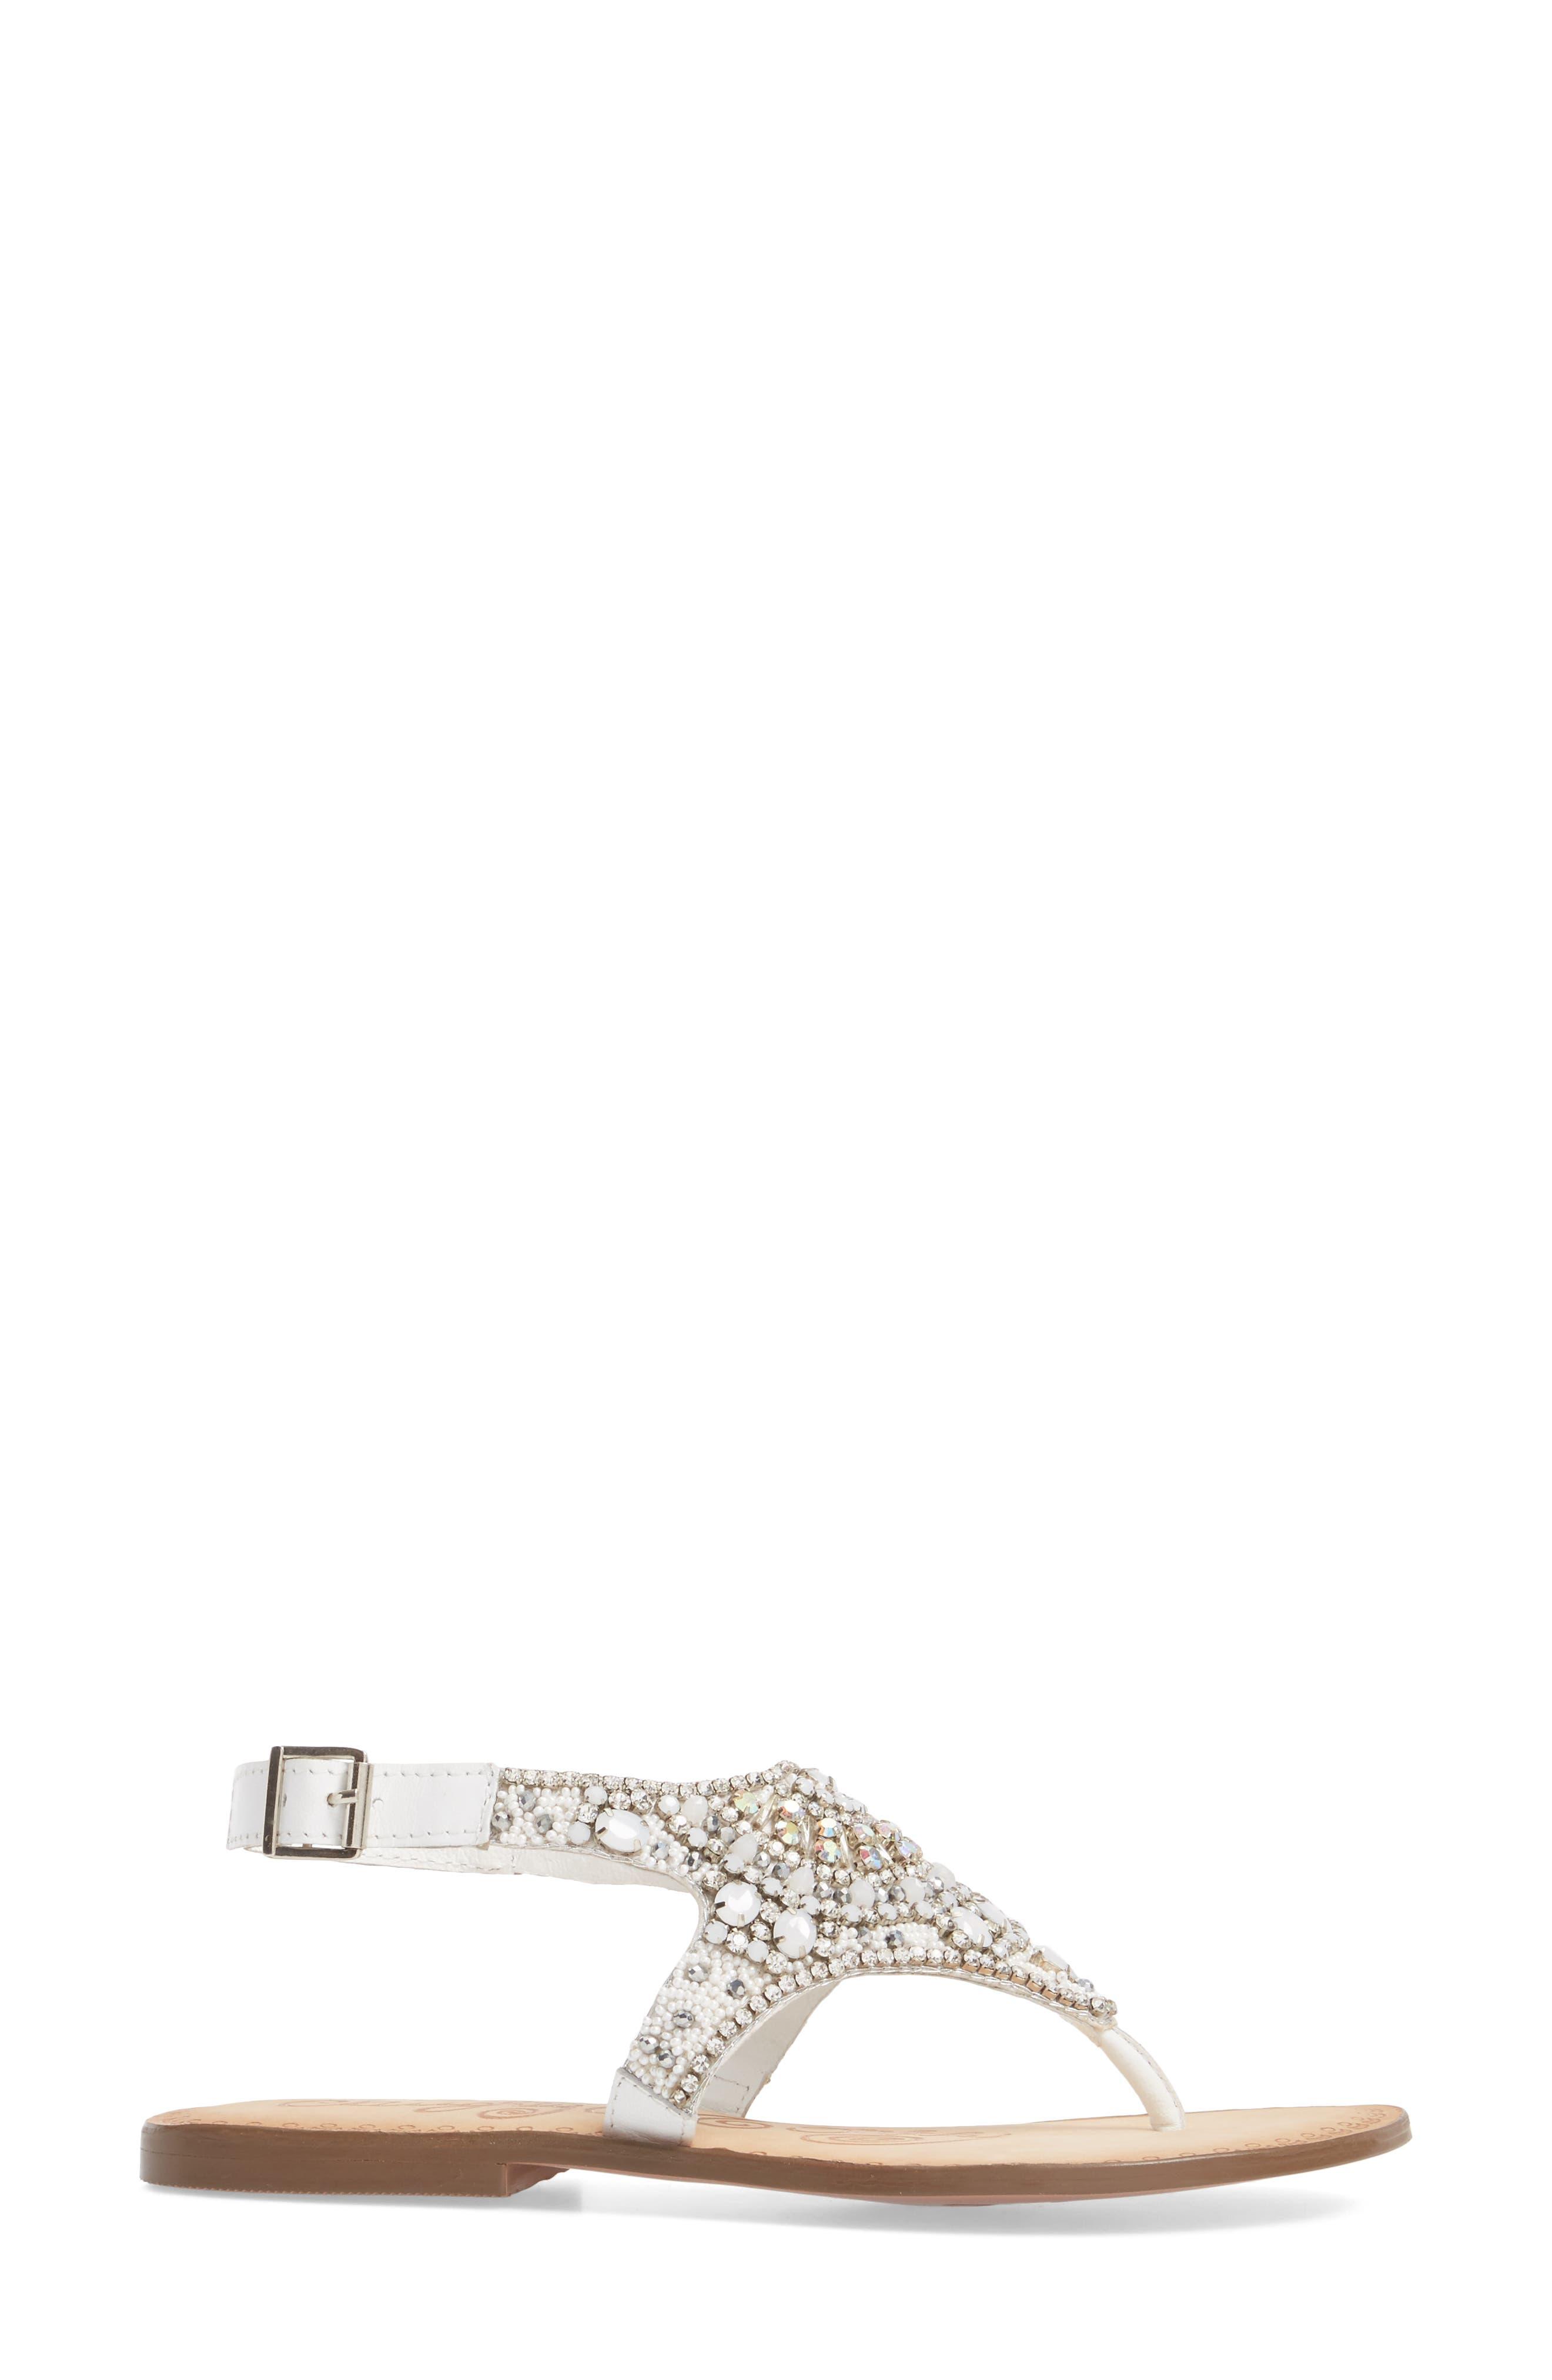 Iceberg Crystal Embellished Sandal,                             Alternate thumbnail 3, color,                             White Leather